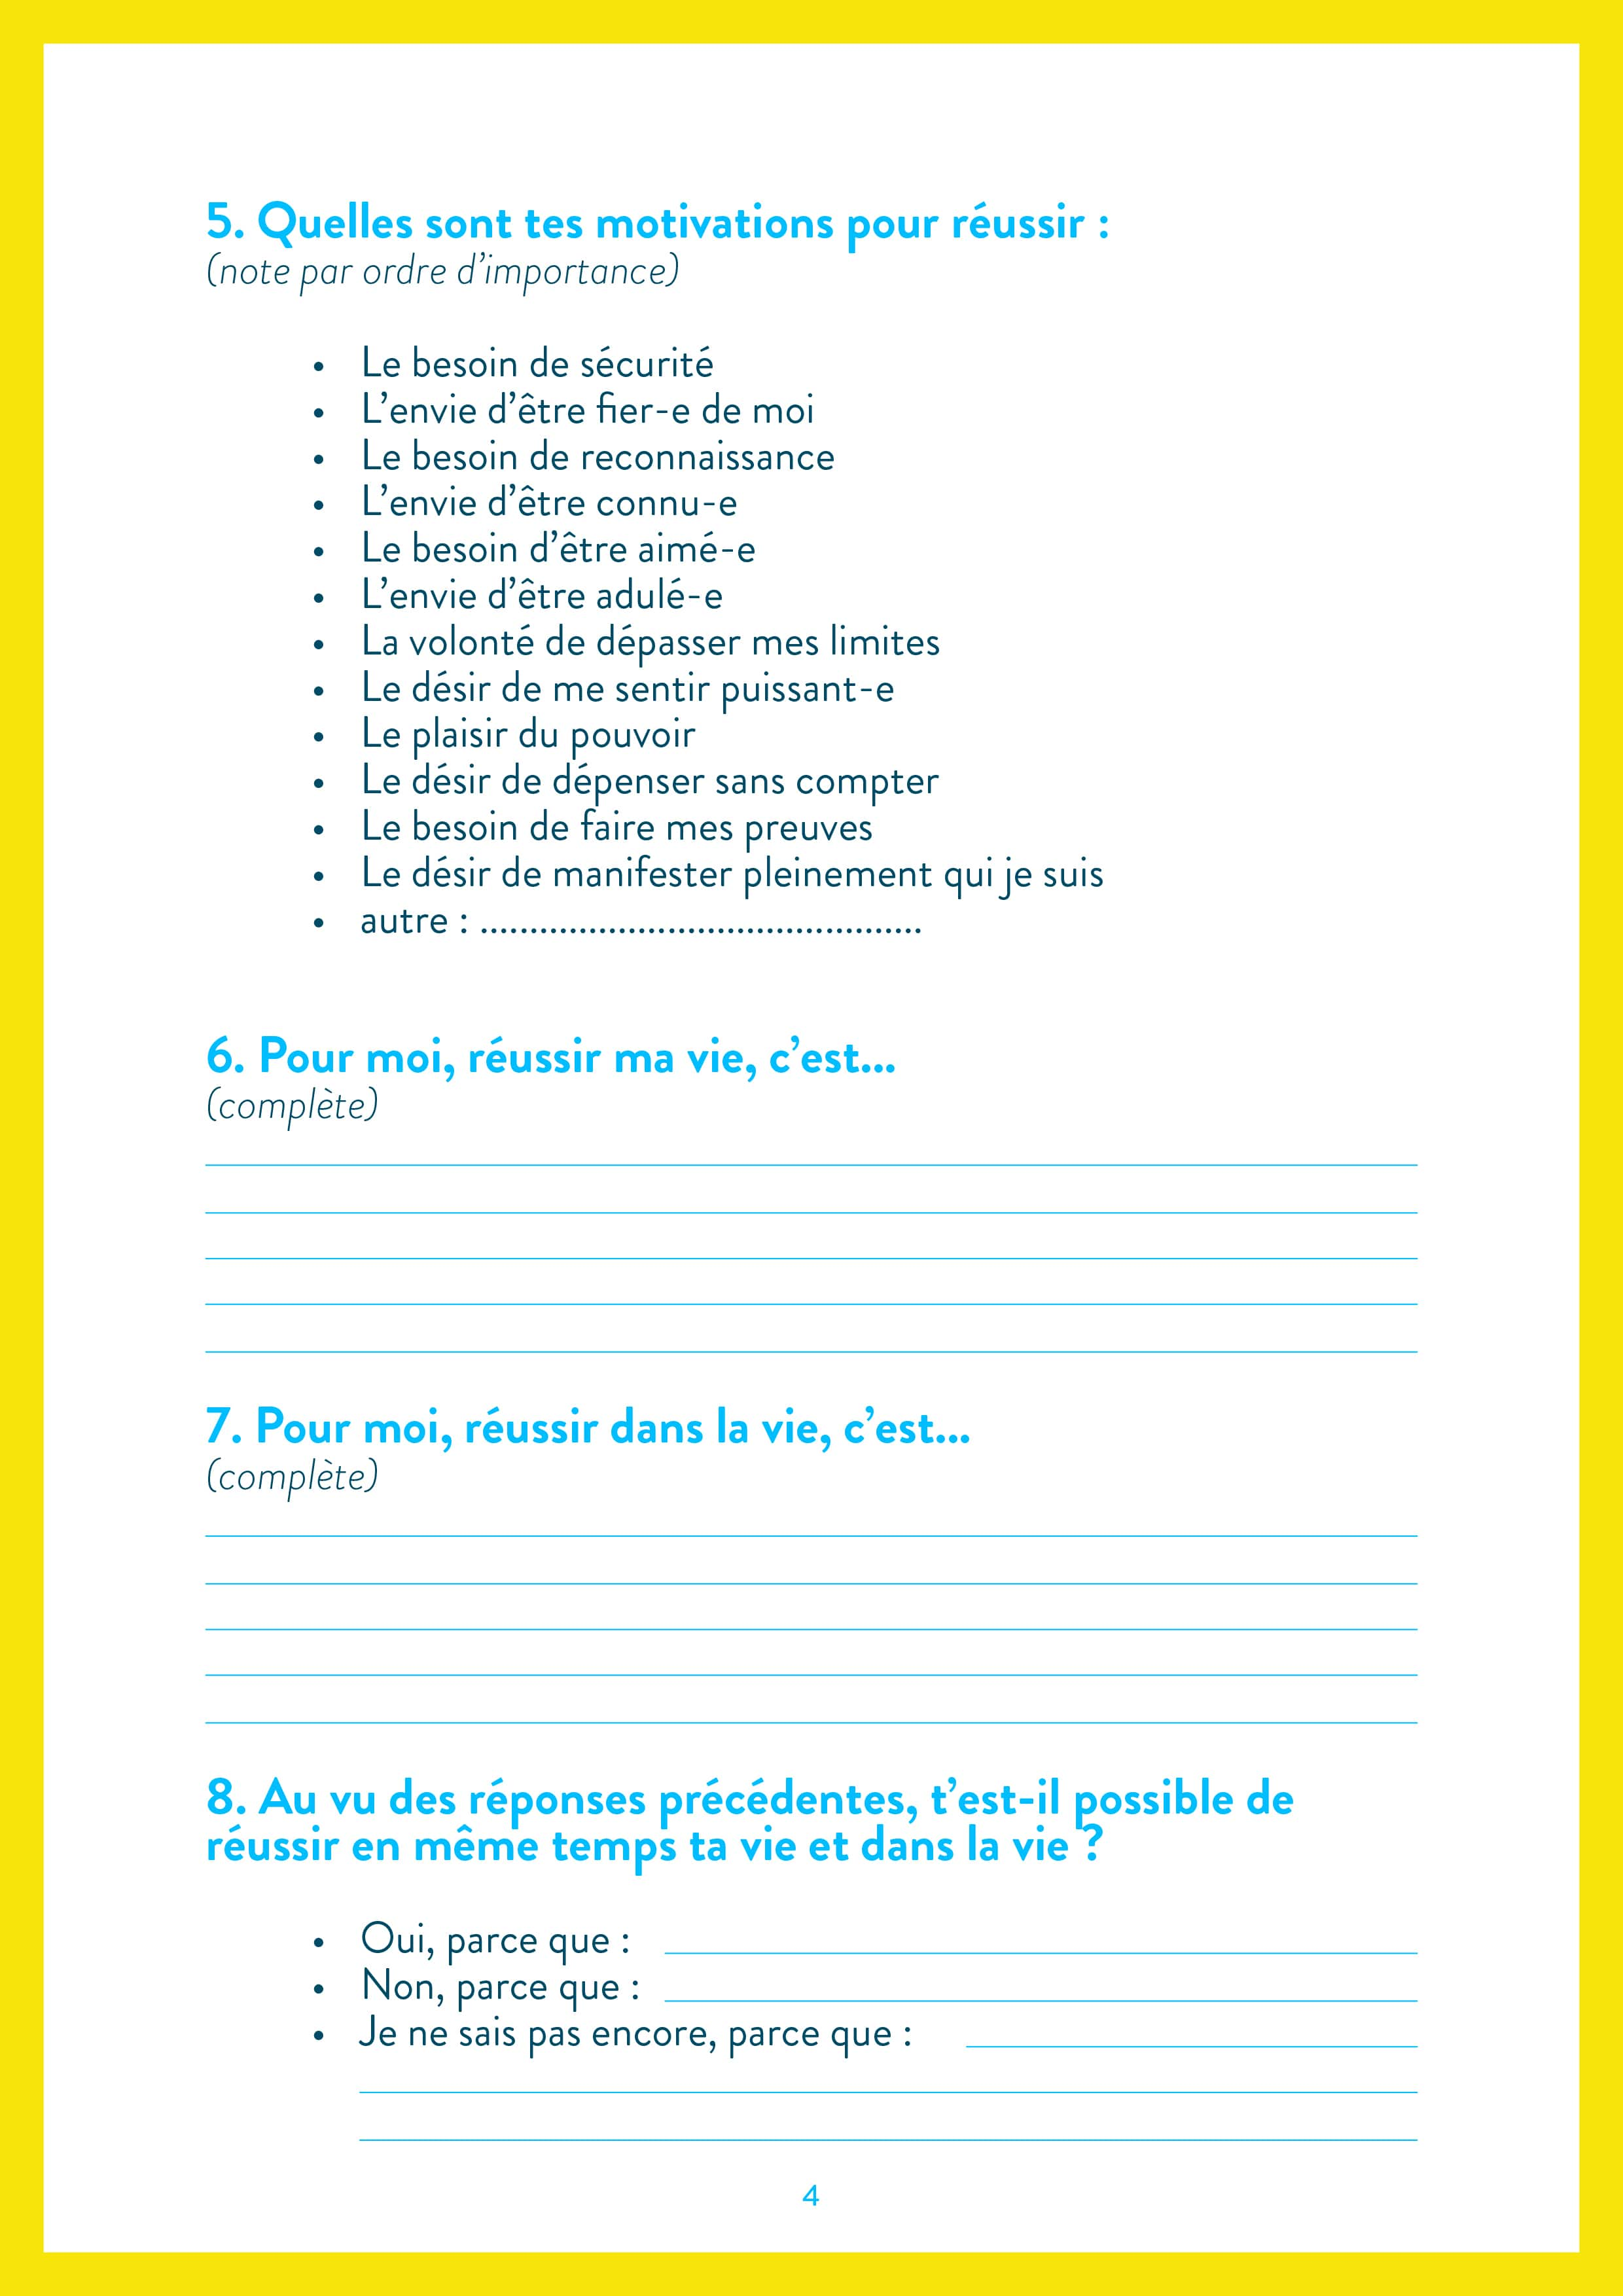 E-coaching-Cahierdexo-reussirsavie-serie1-4.jpg